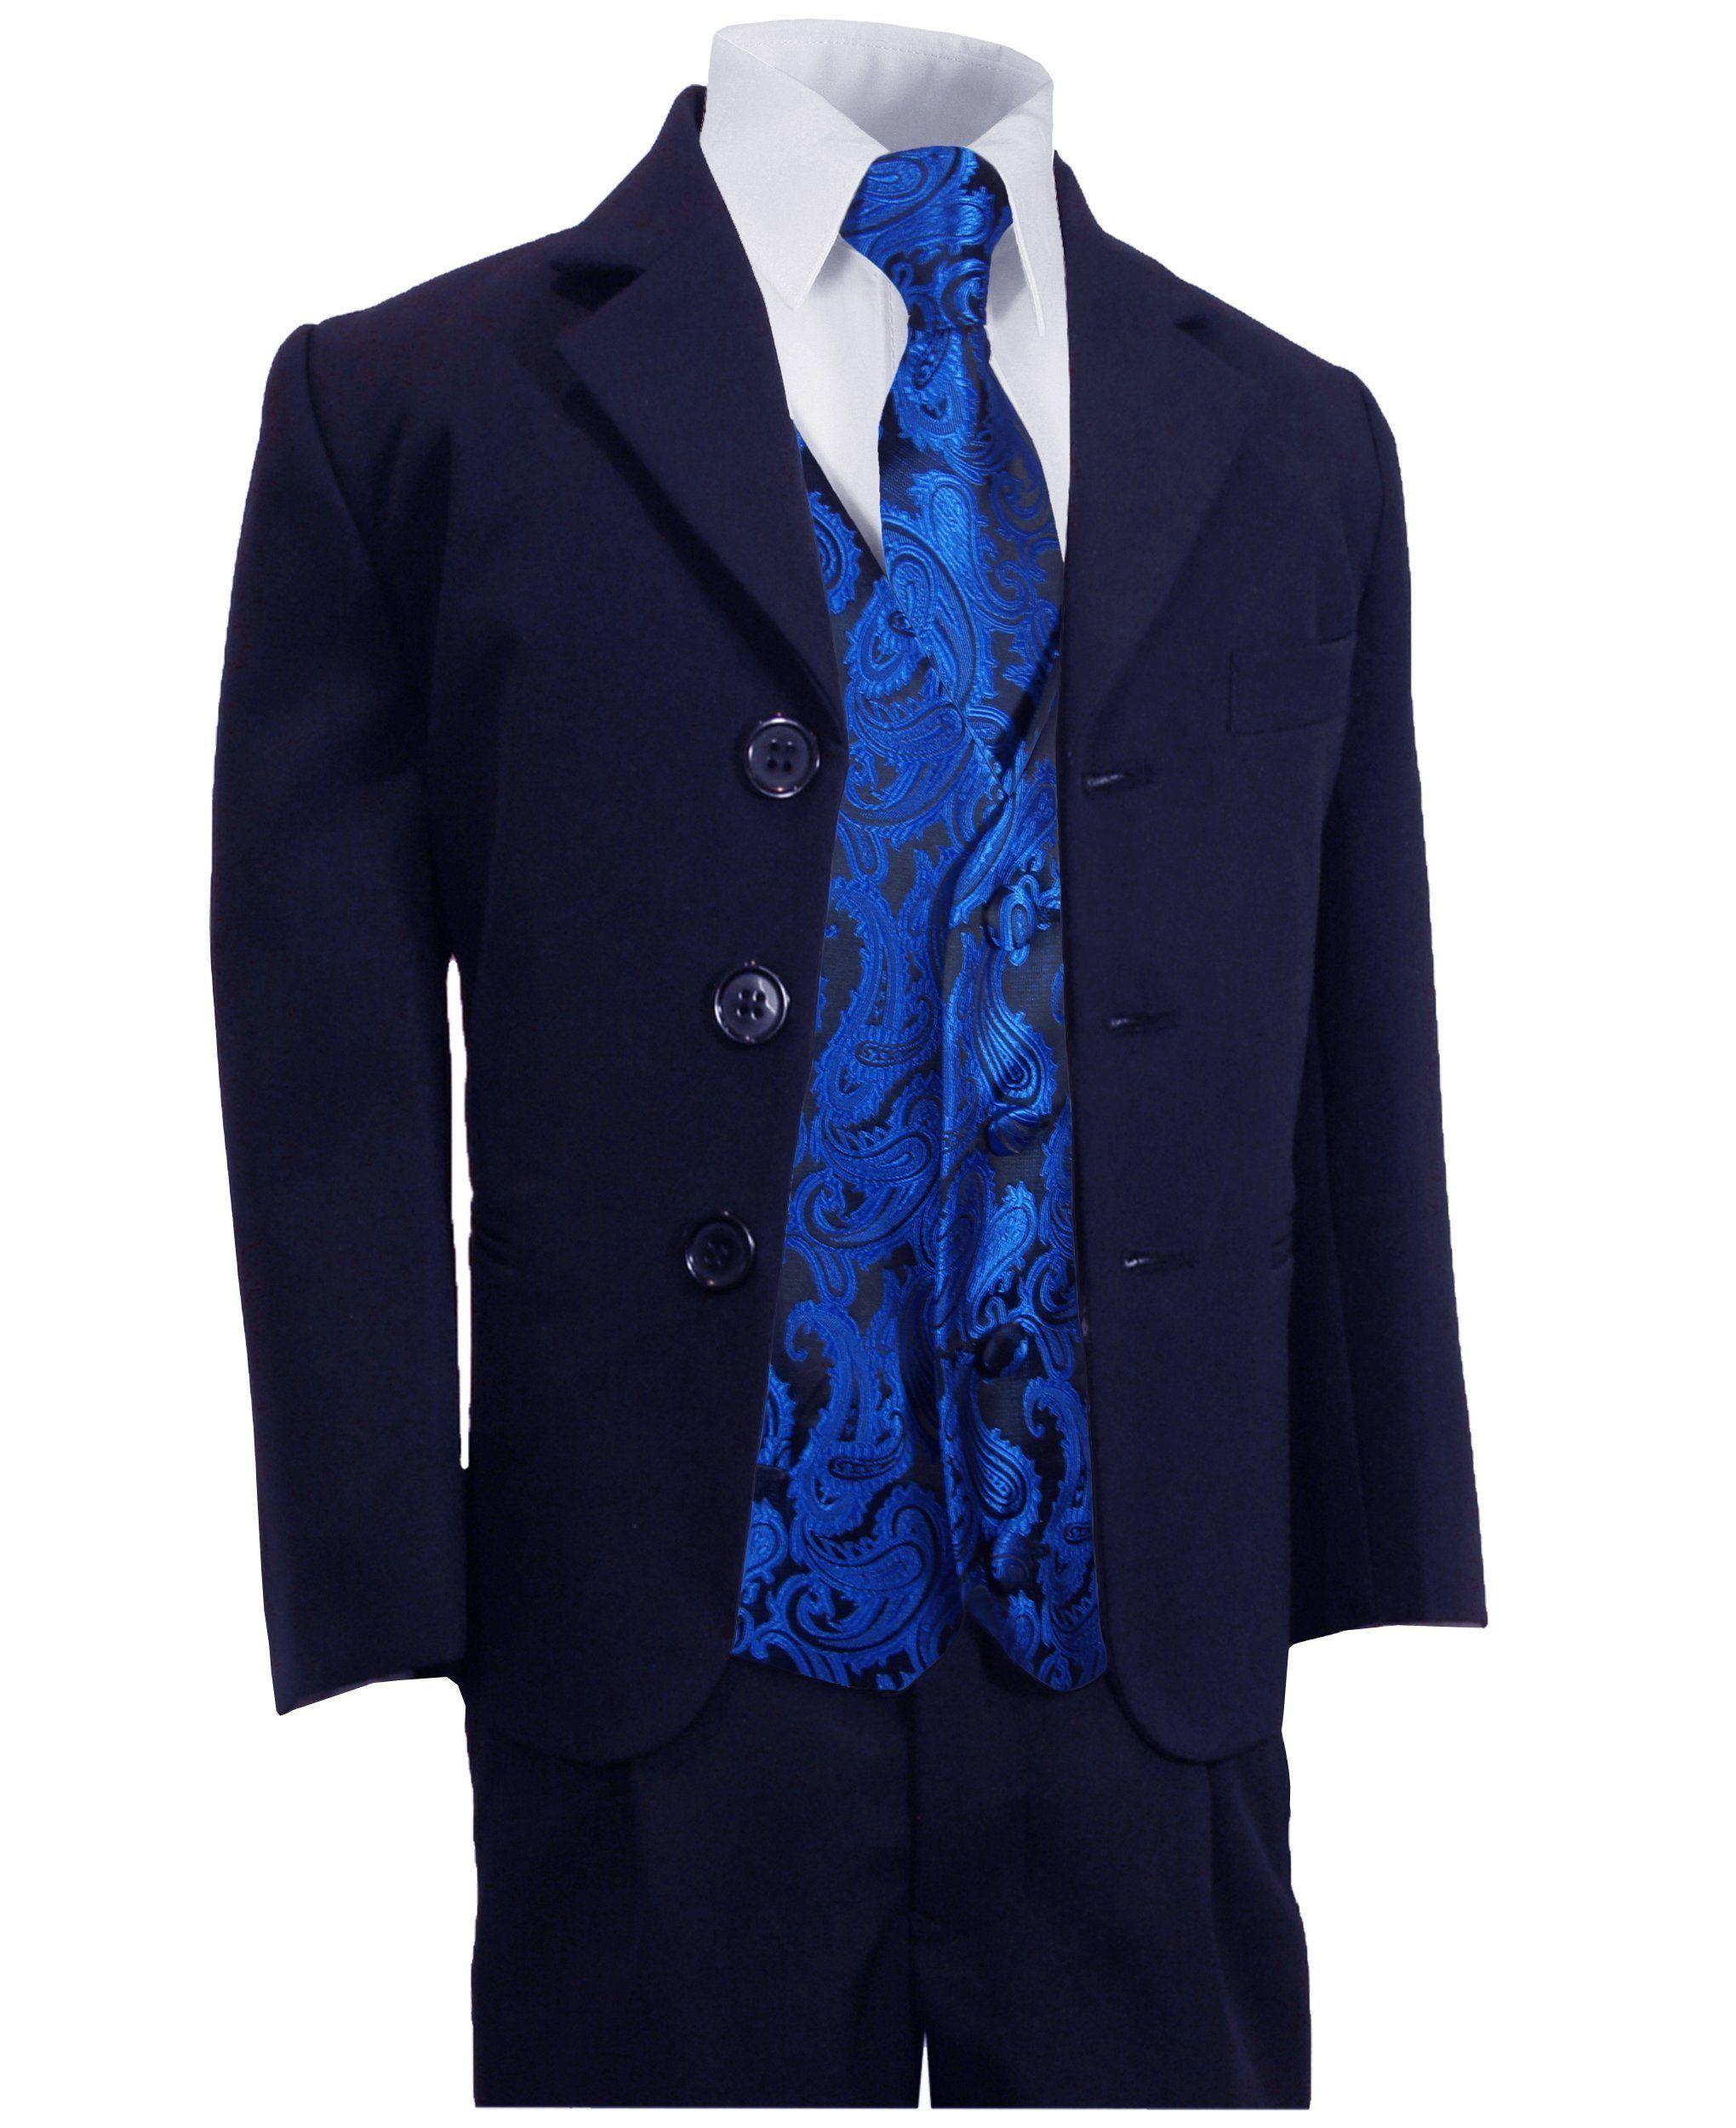 Navy Blue Boys Suit With Royal Blue Paisley Tuxedo Vest Set Kinder Anzug Anzug Anzug Jungen